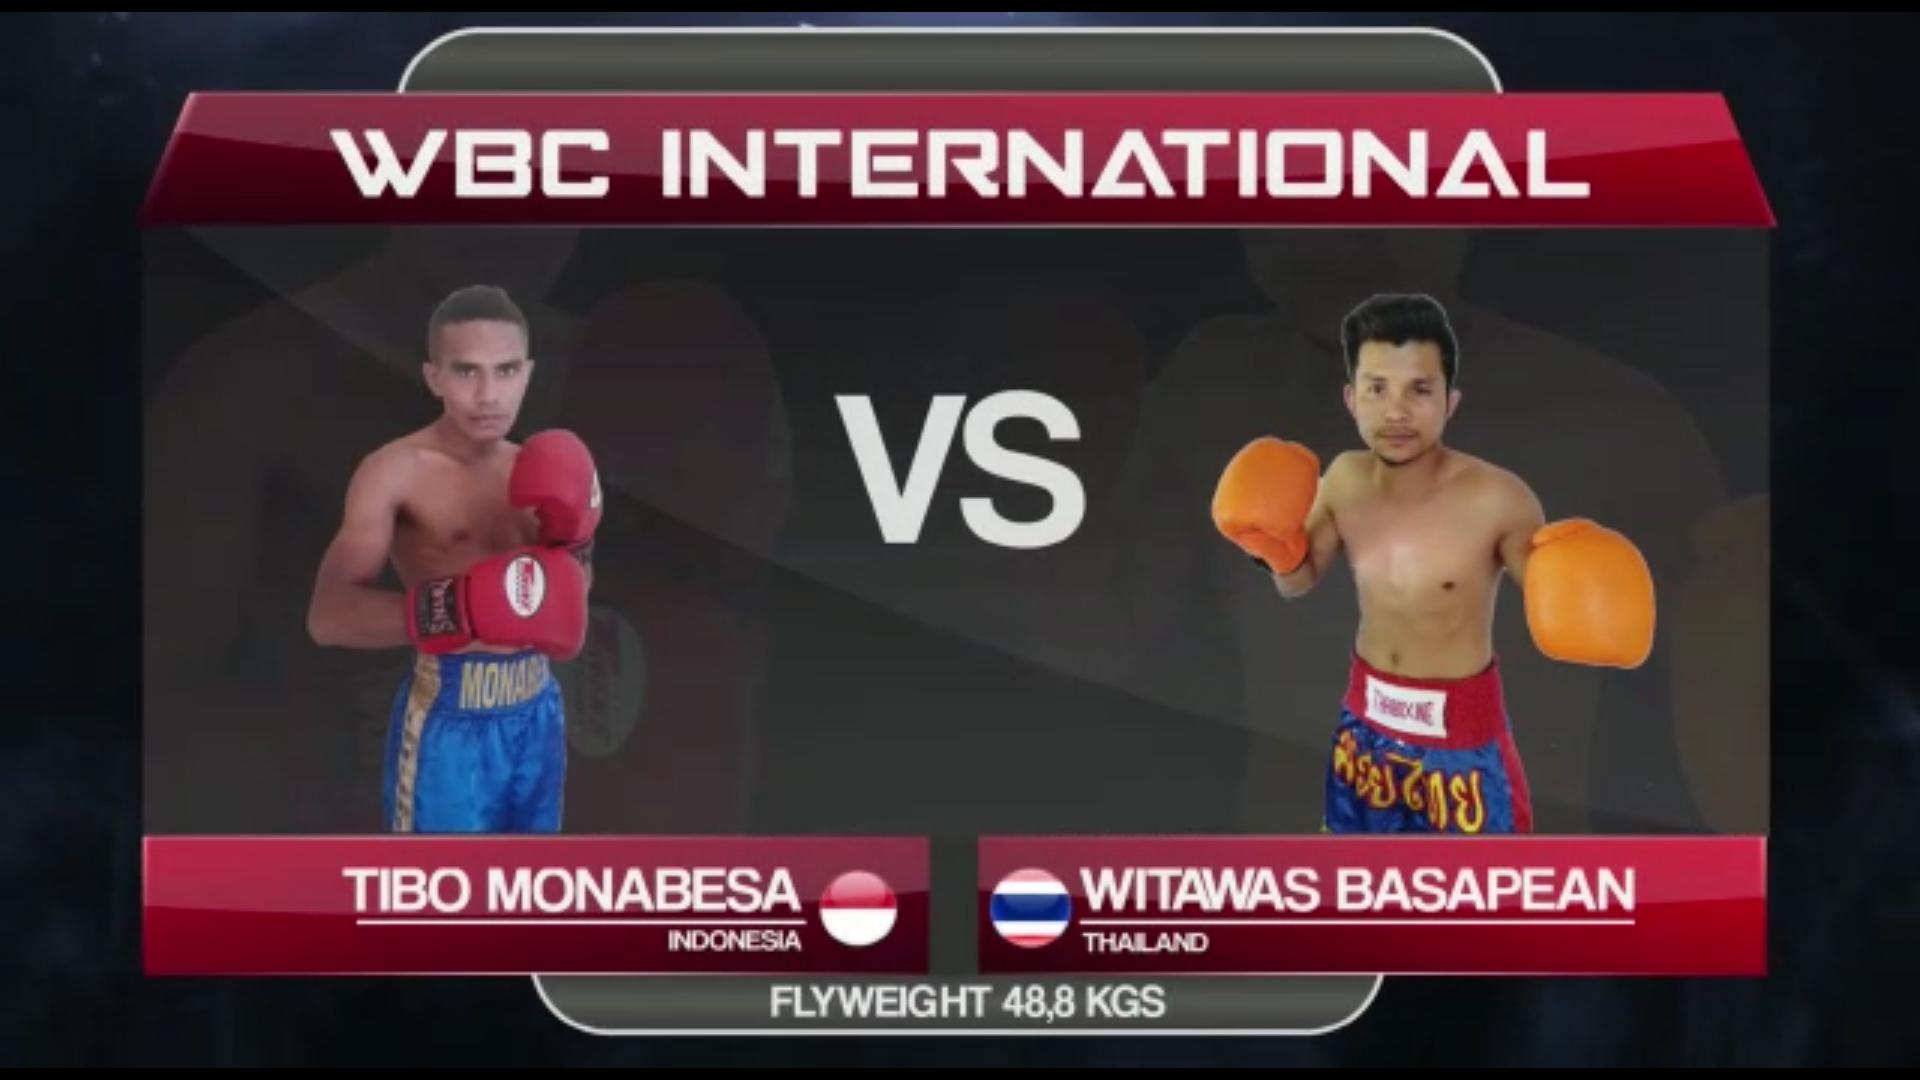 Malang Super Fight (MSF) Ke-26 yang berlangsung 29 Maret menghadirkan petinju kelas WBC Internasional dari Filipina dan Thailand.